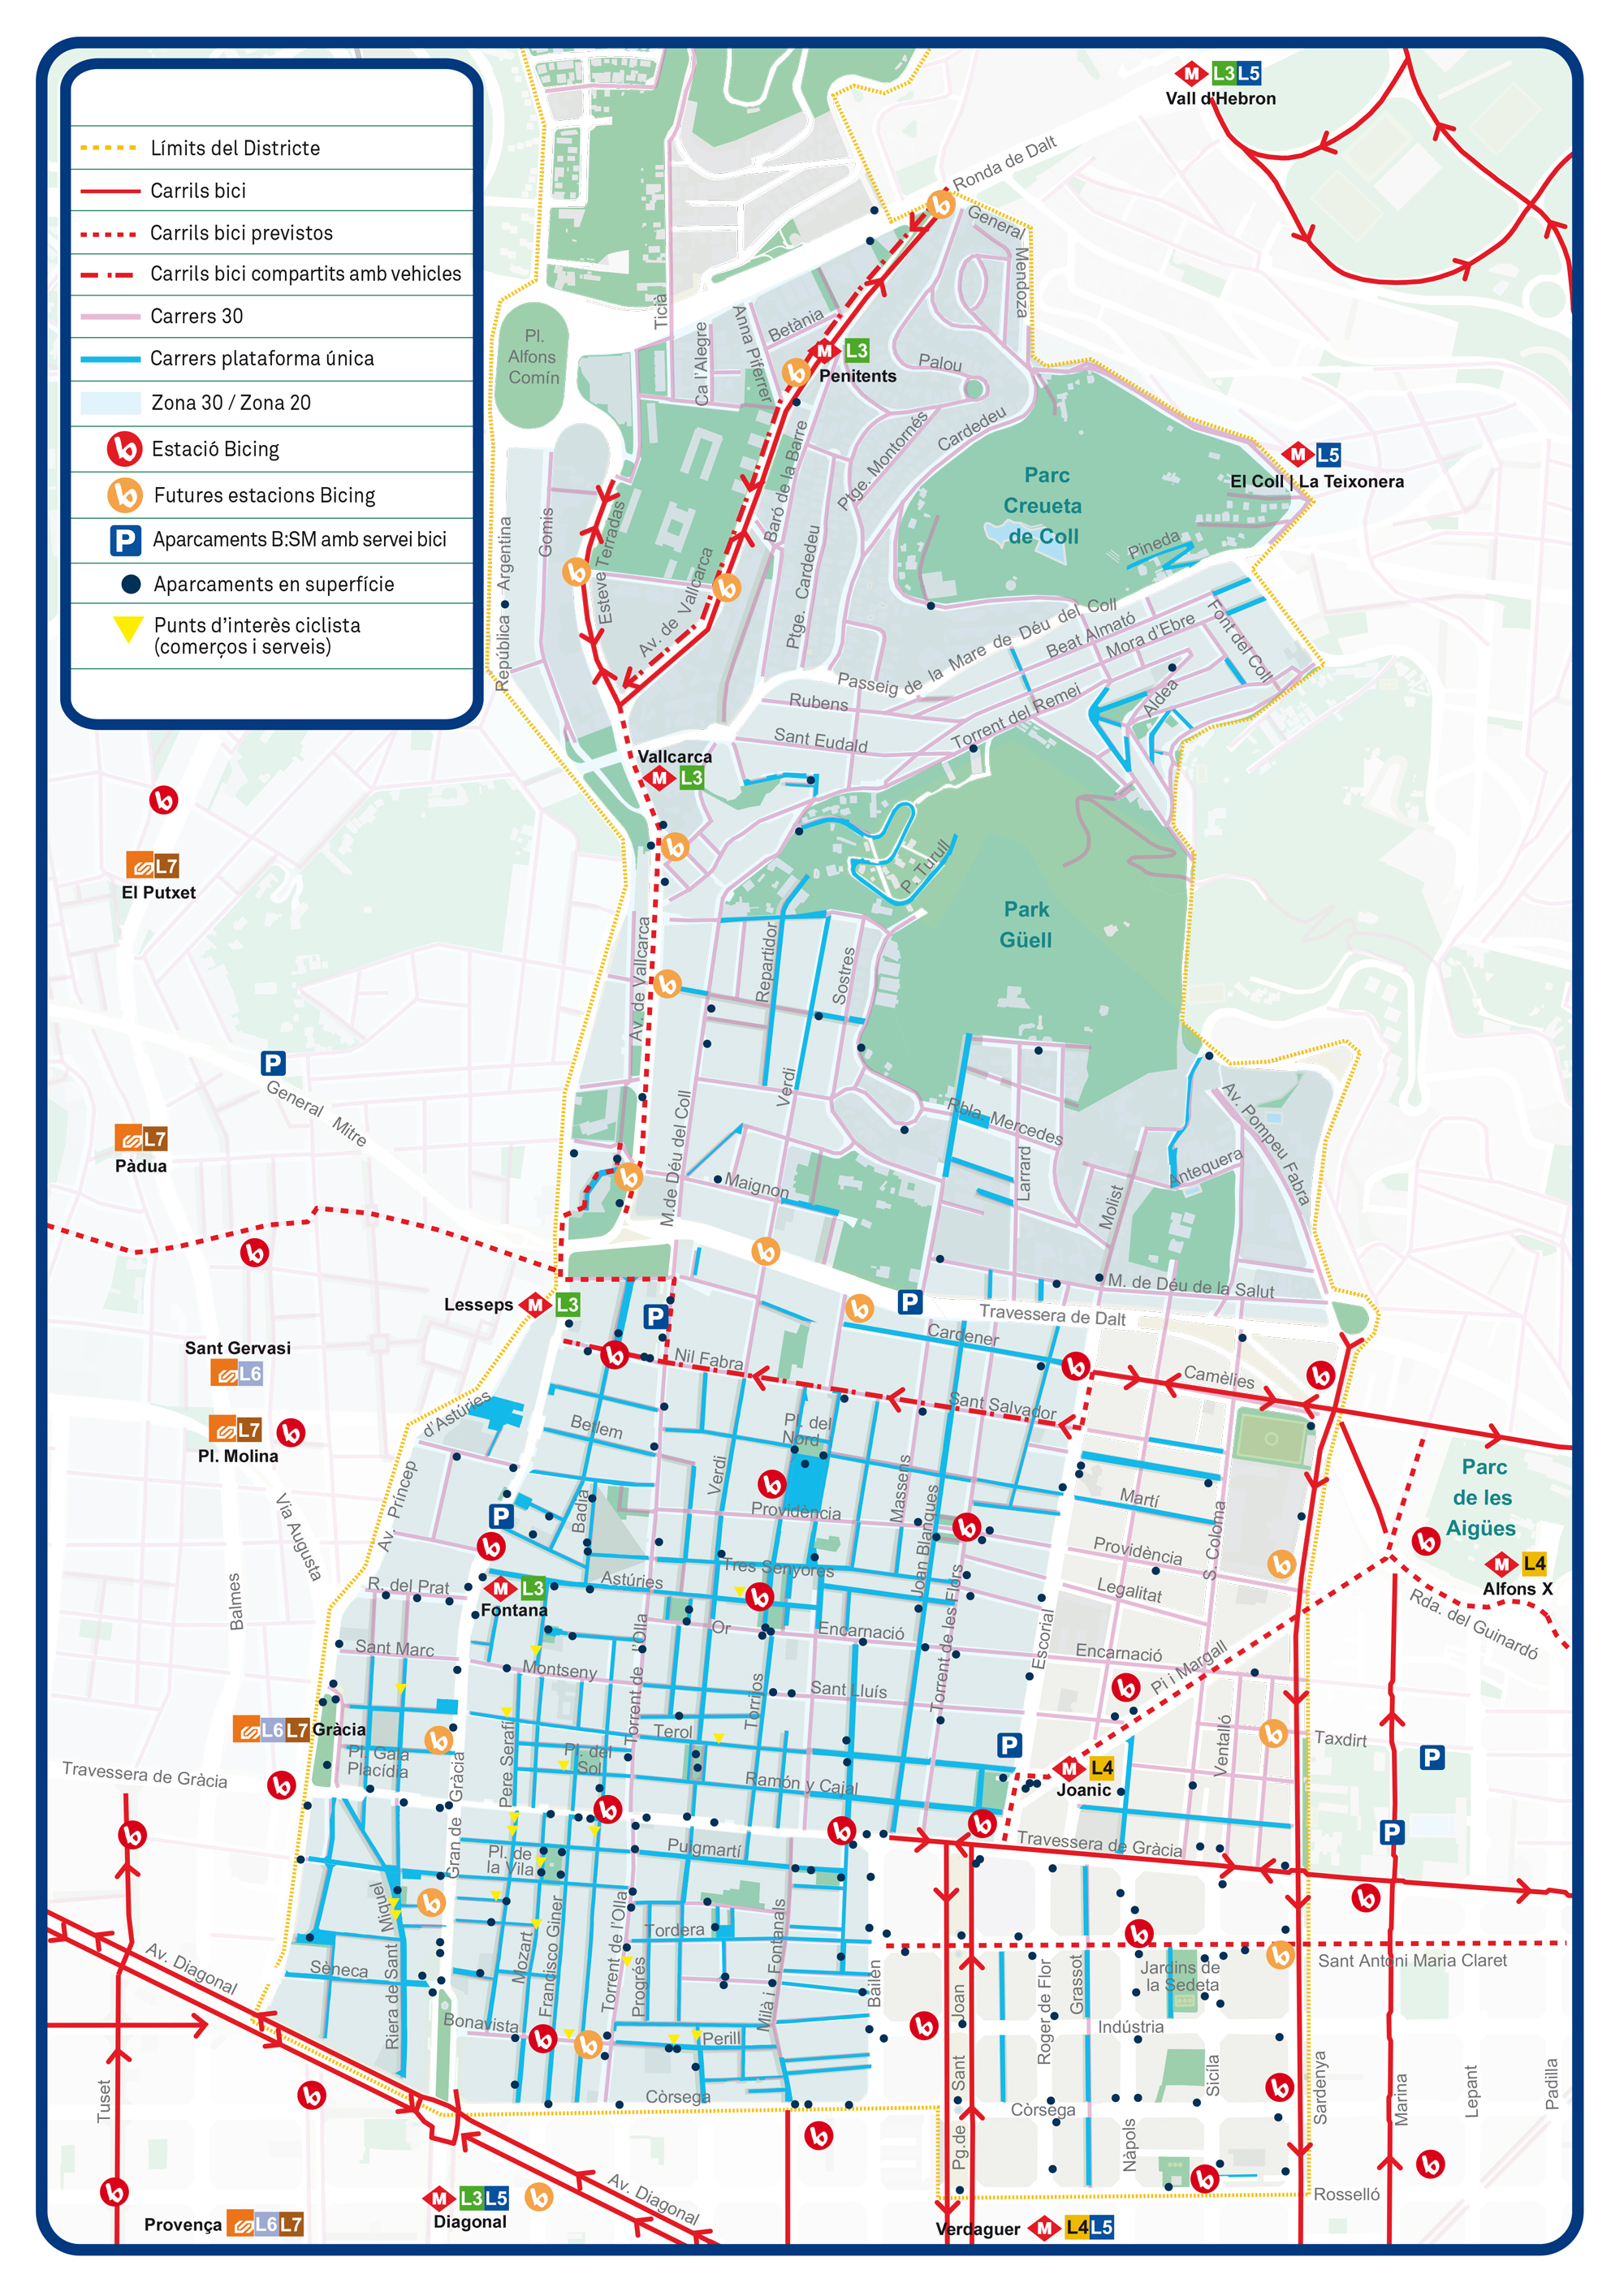 Mapa Carril Bici Barcelona.Mapa De Vias Ciclables De Gracia Bicicleta